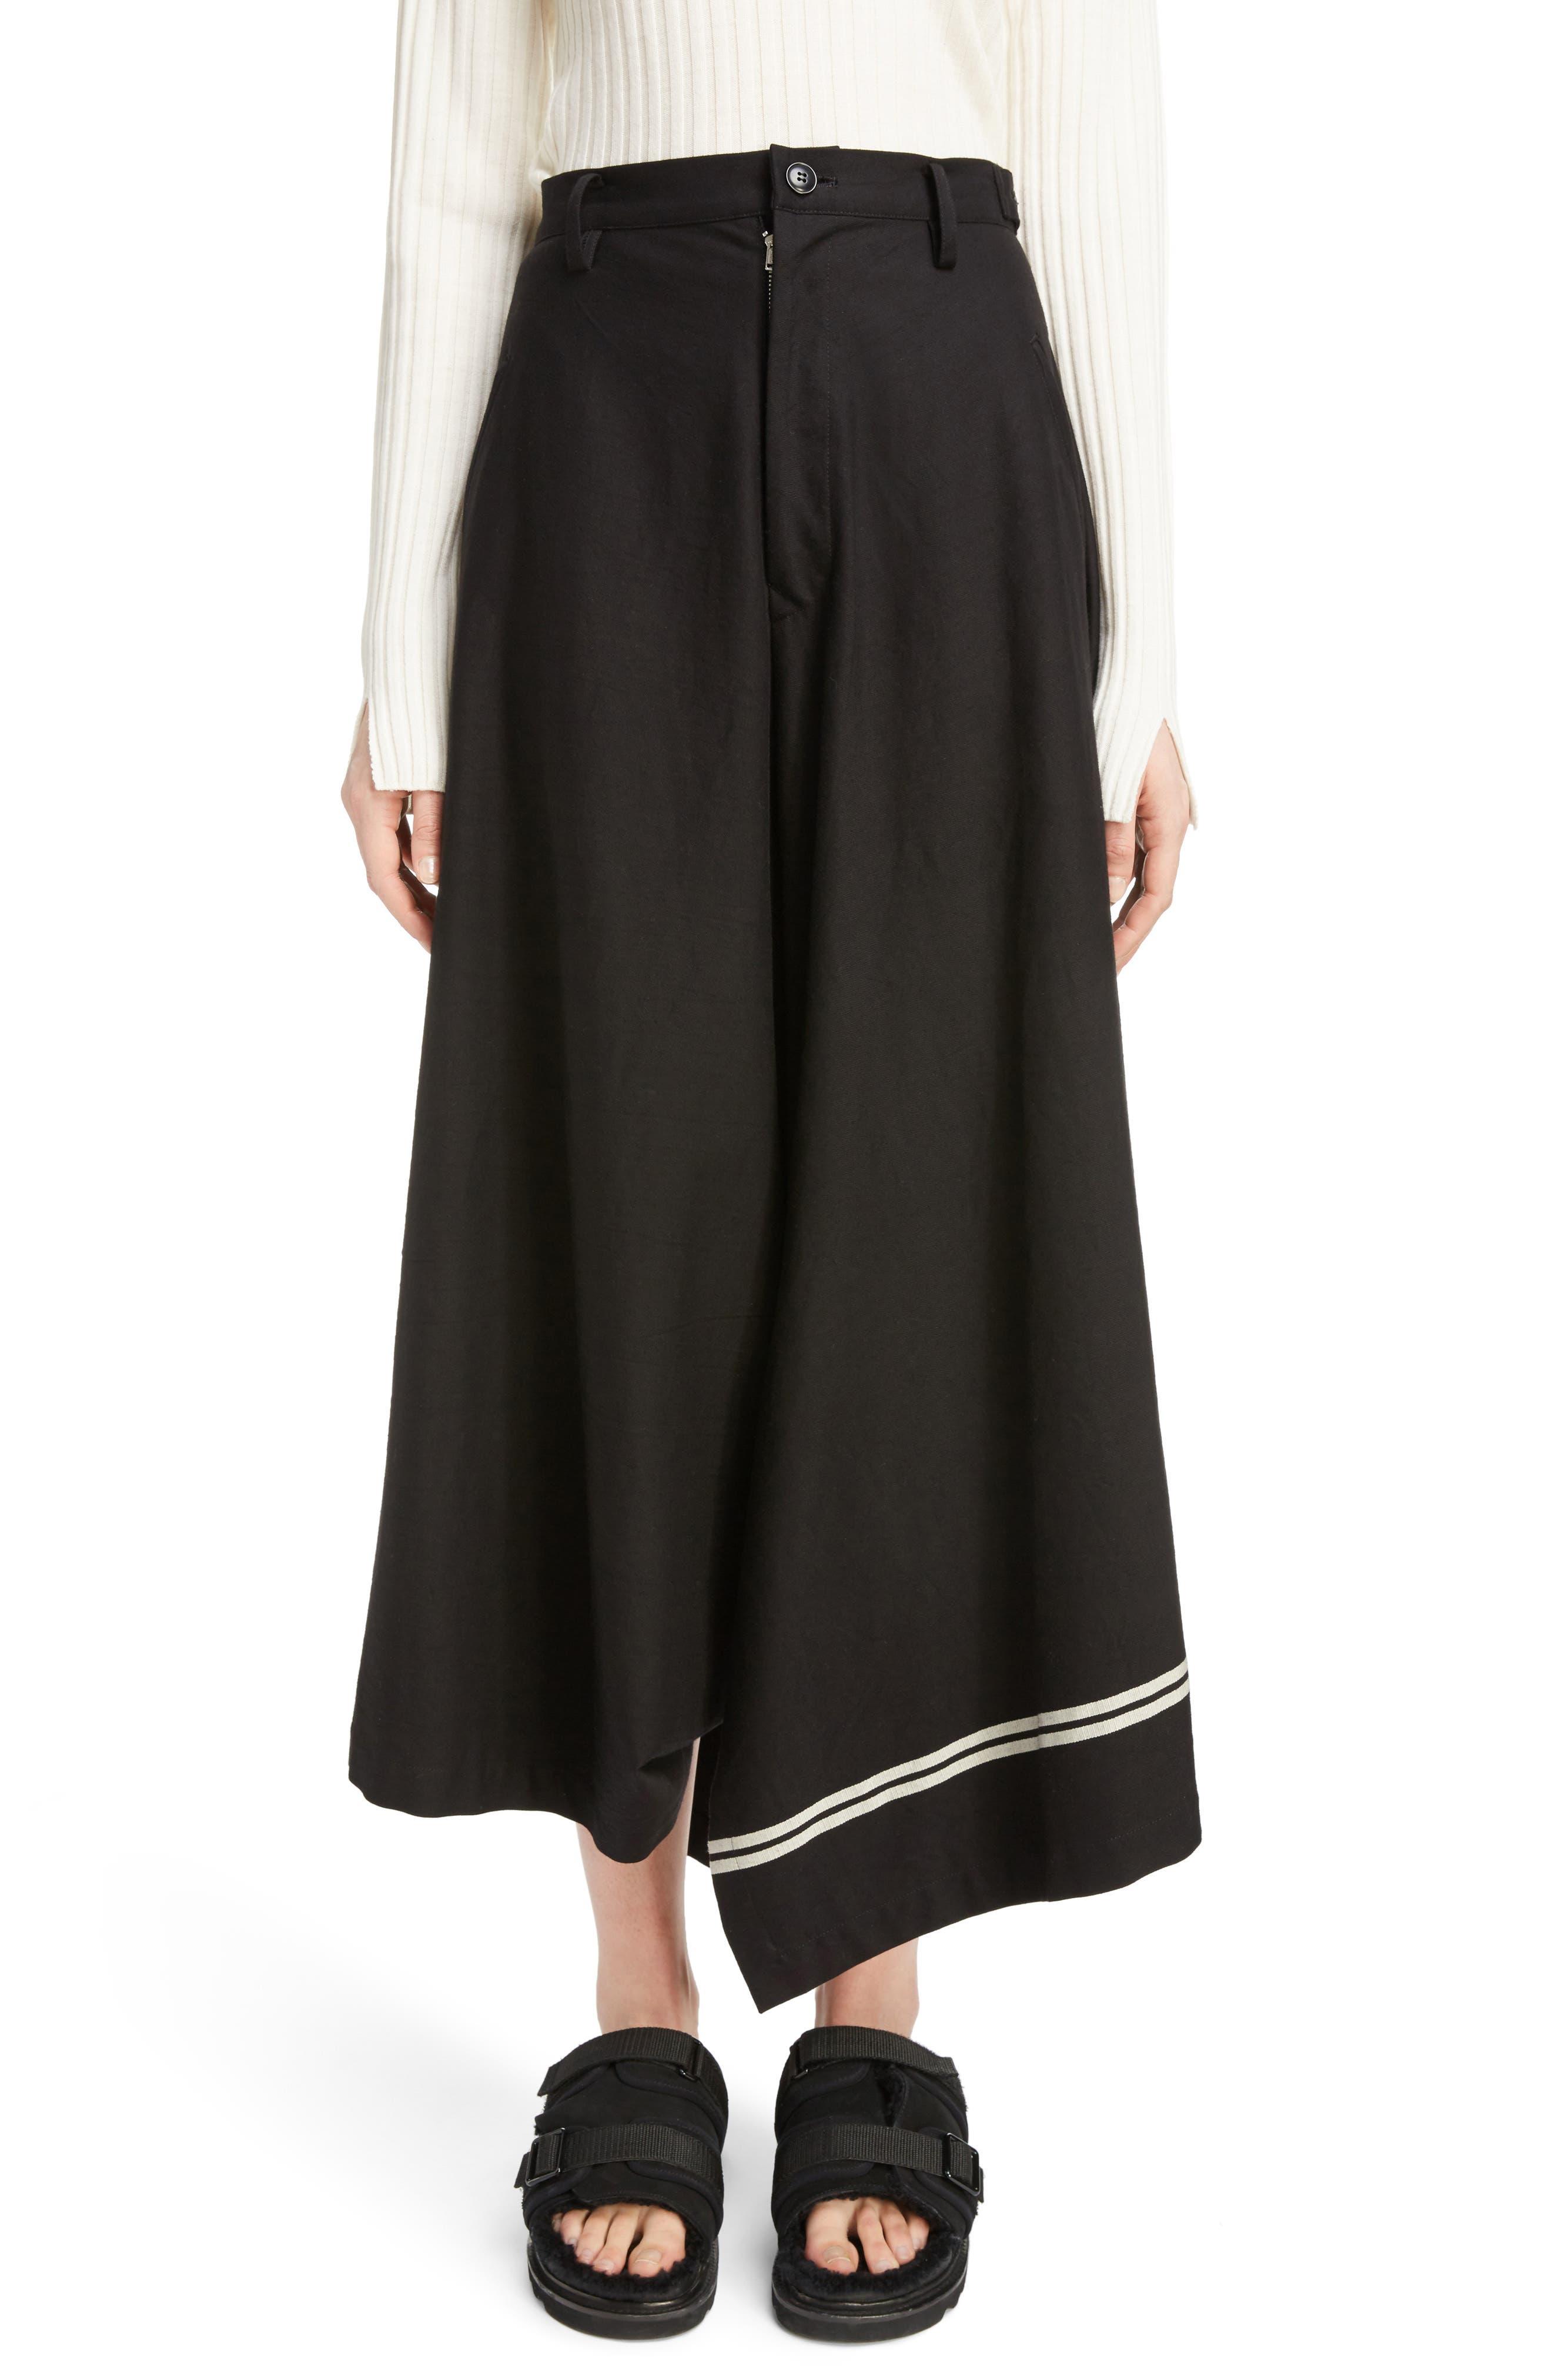 Y's by Yohji Yamamoto Dart Front Skirt